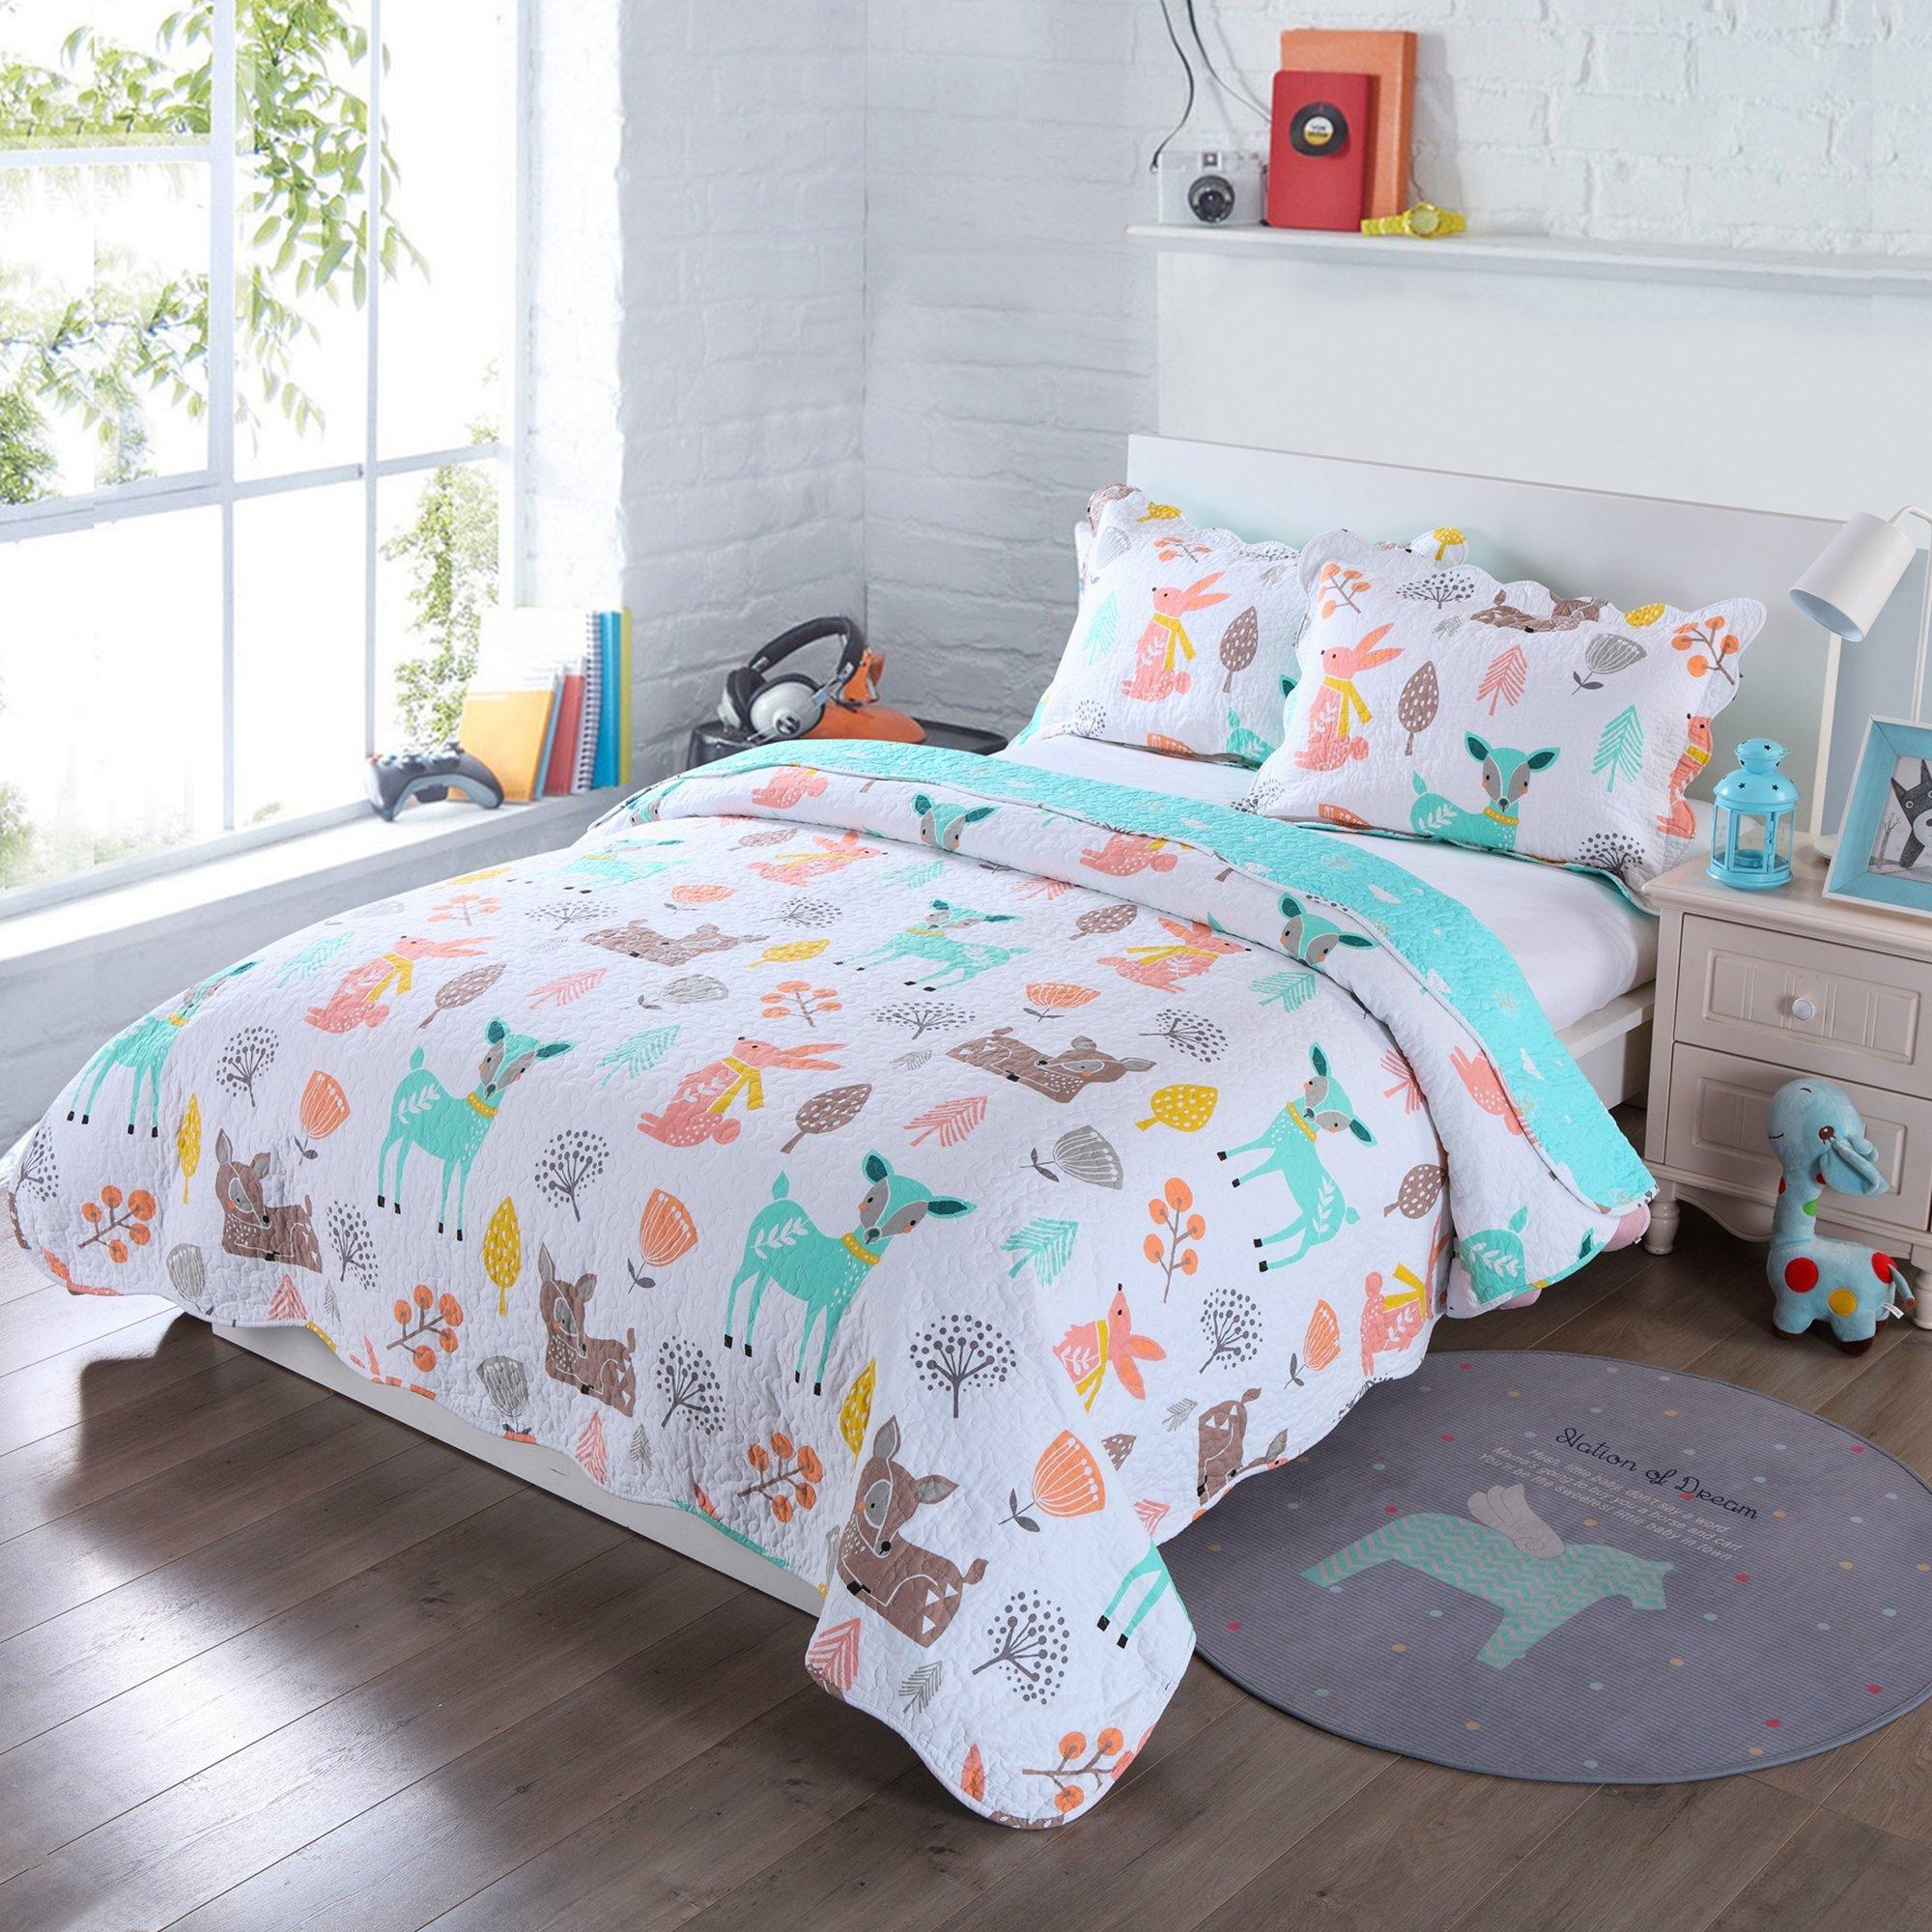 100% Cotton 3 Piece Kids Quilt Bedspread Comforter Set Throw Blanket for Teens Boys Girls Kids Beds Bedding Coverlet Teal Blue Forest Deer (Full)